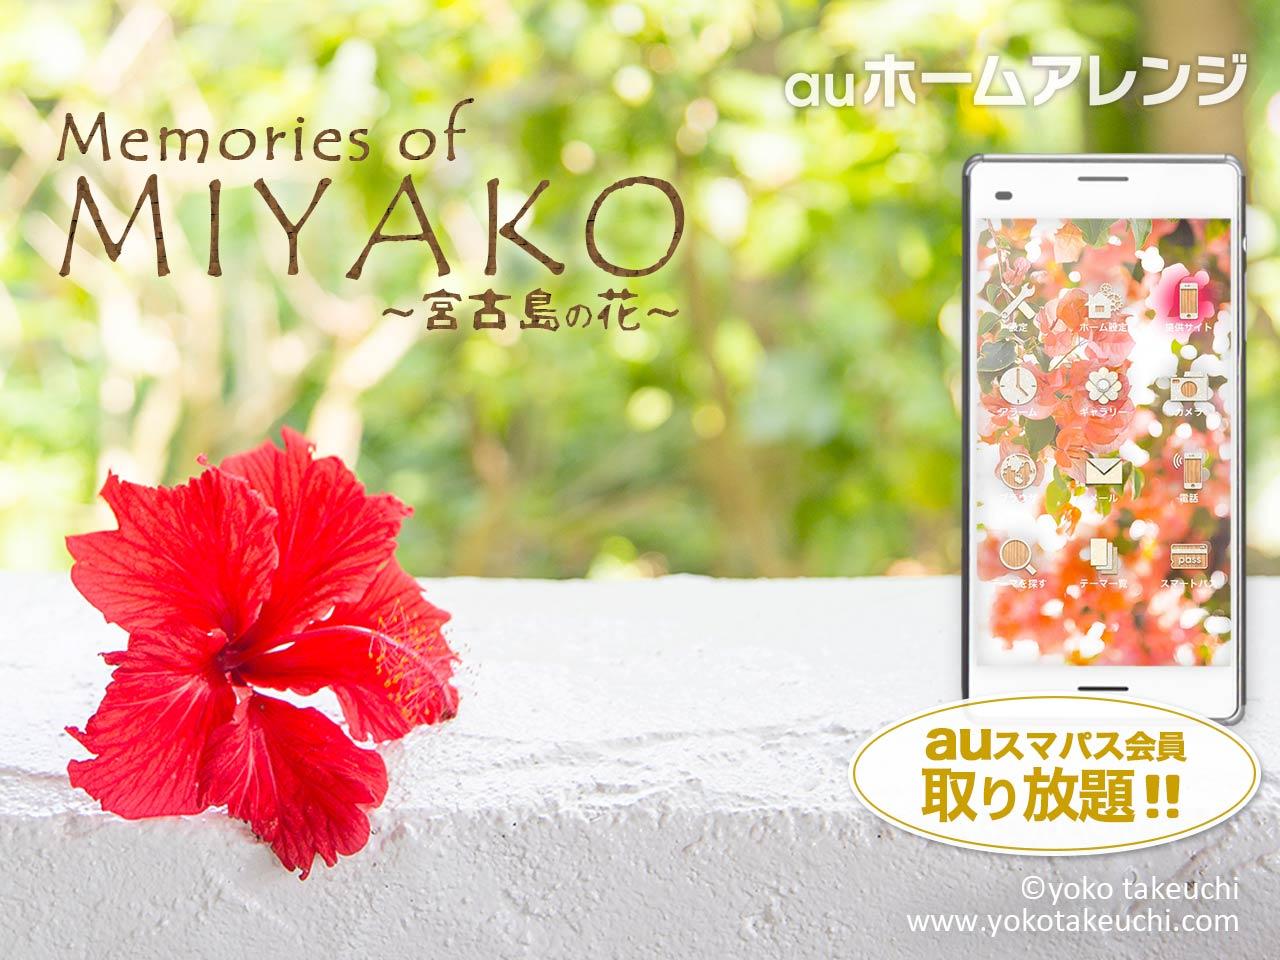 Au スマートパス 壁紙 17 竹内陽子 Yokotakeuchi フラワーアーティスト Flower Artist 写真家 フォトグラファー